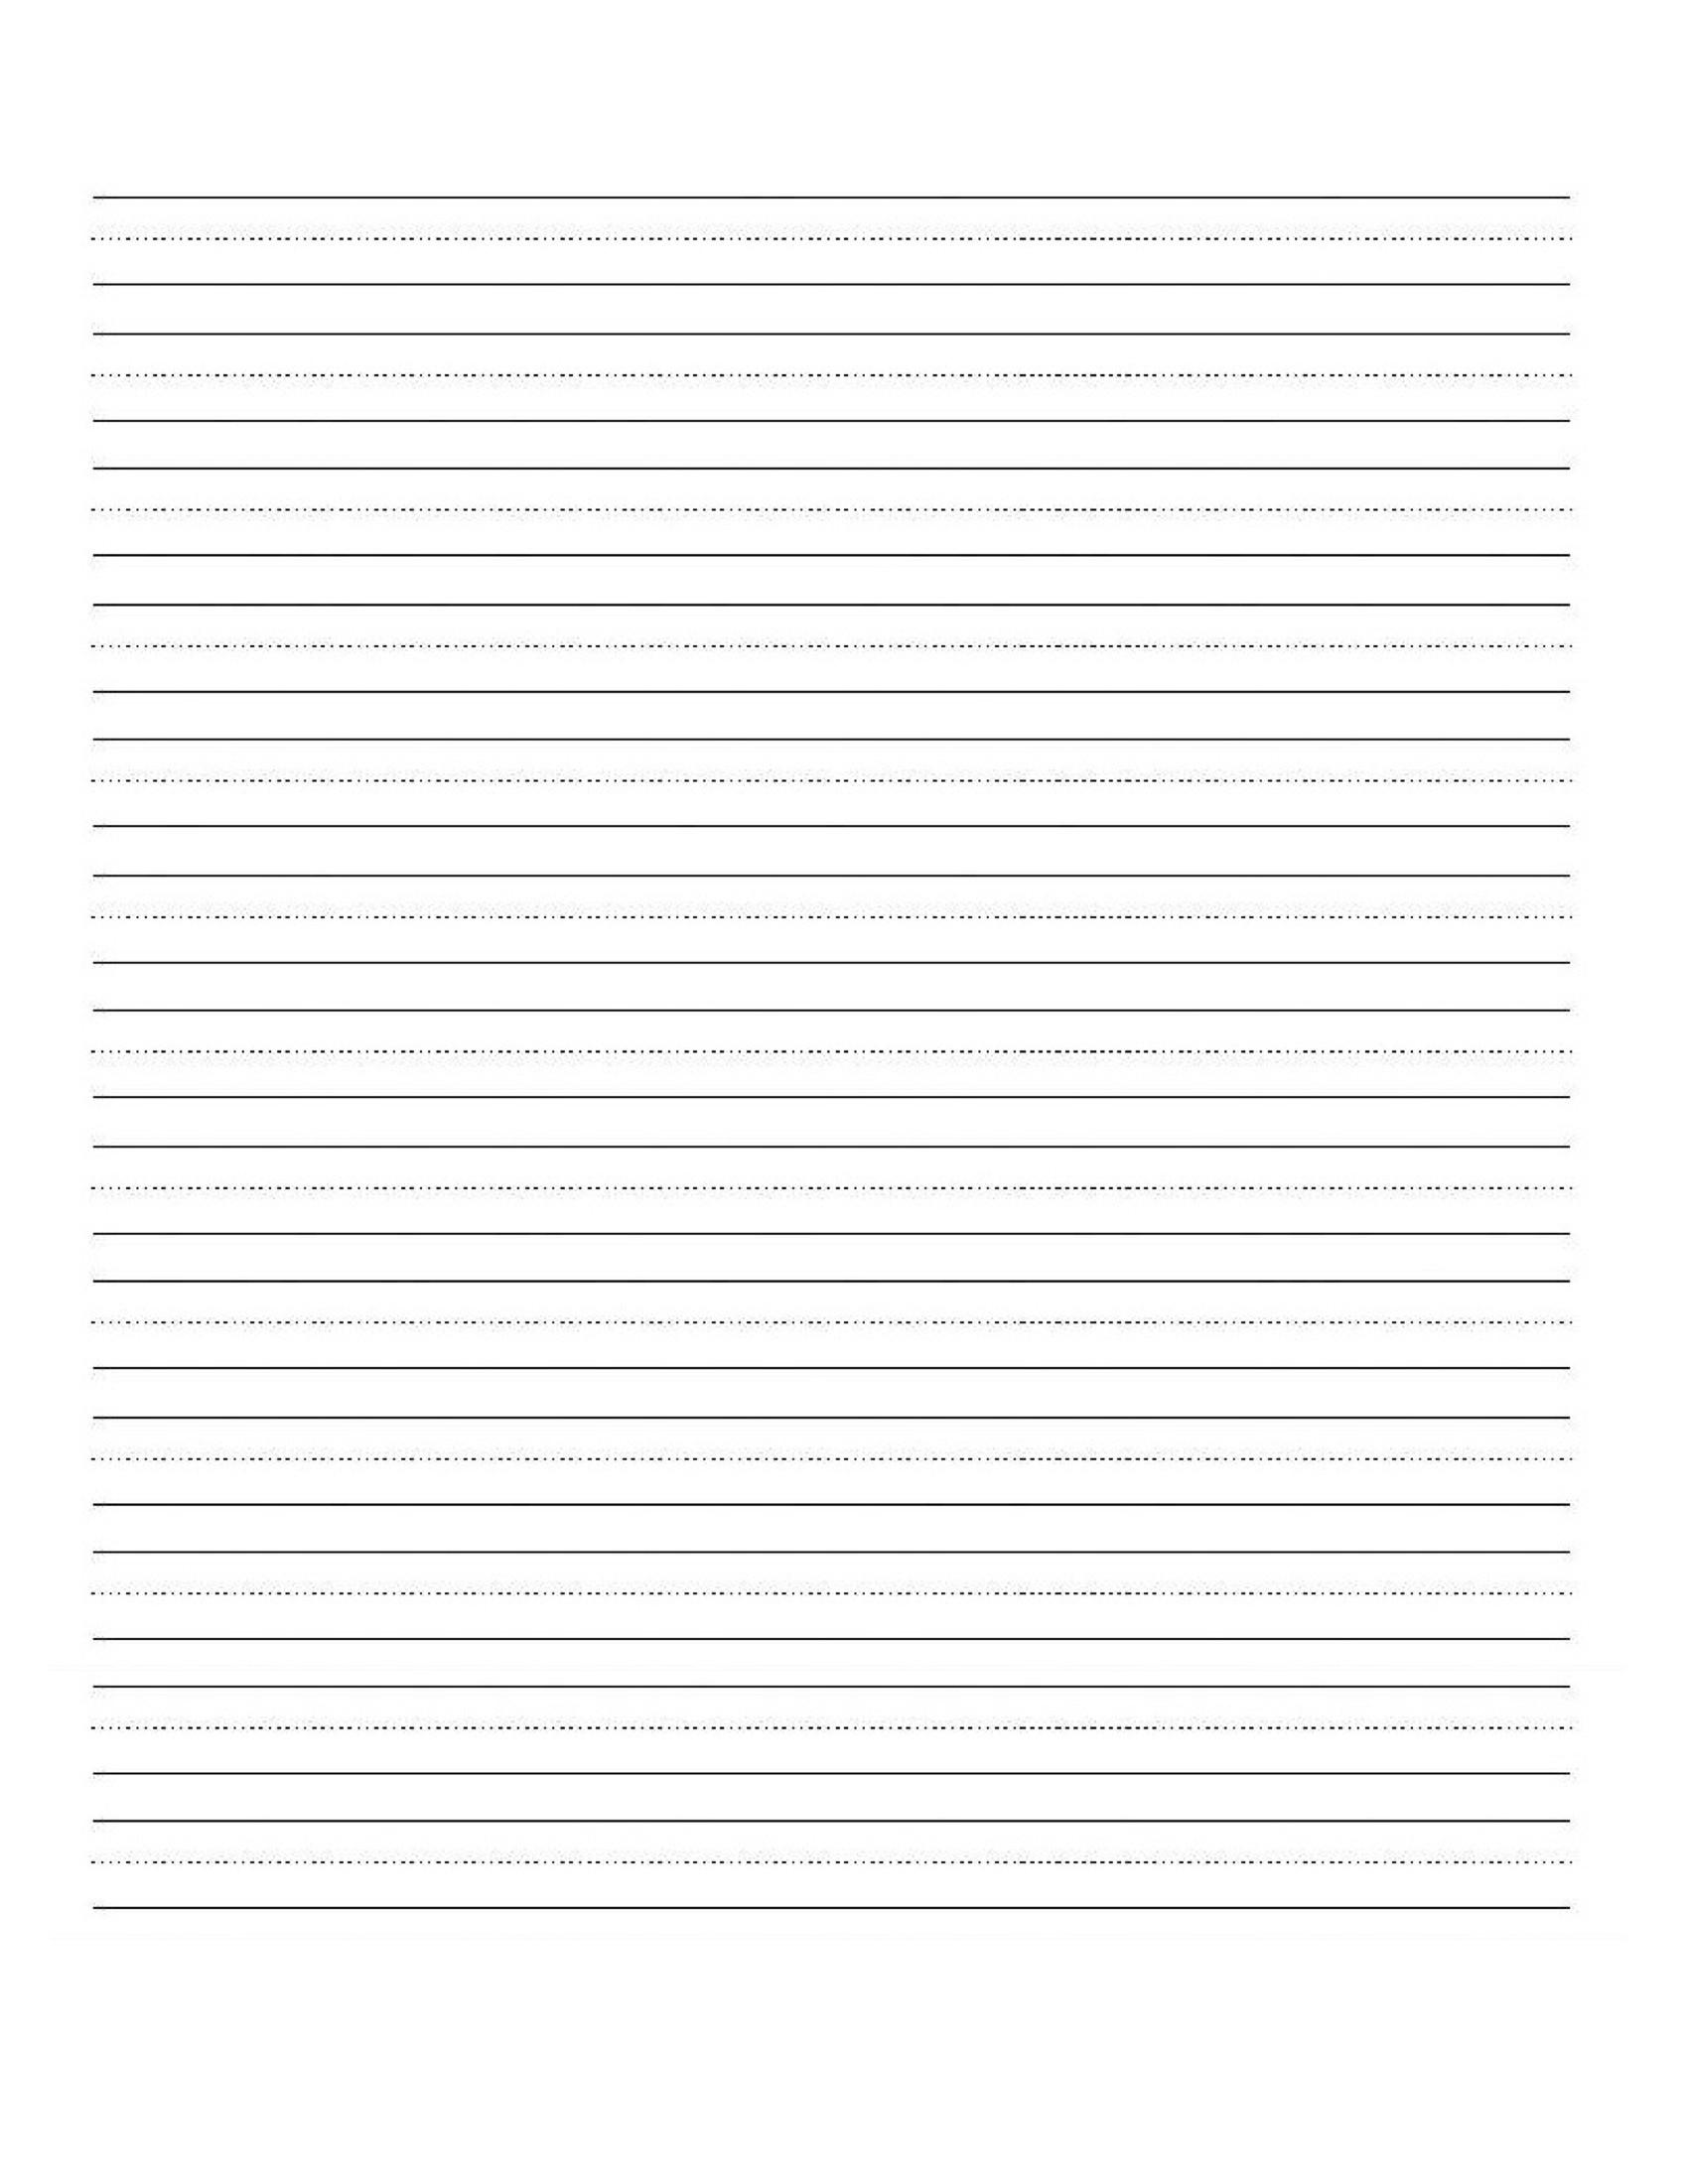 Free Printable Homework Sheets – Nilekayakclub  Blank Assignment Sheet